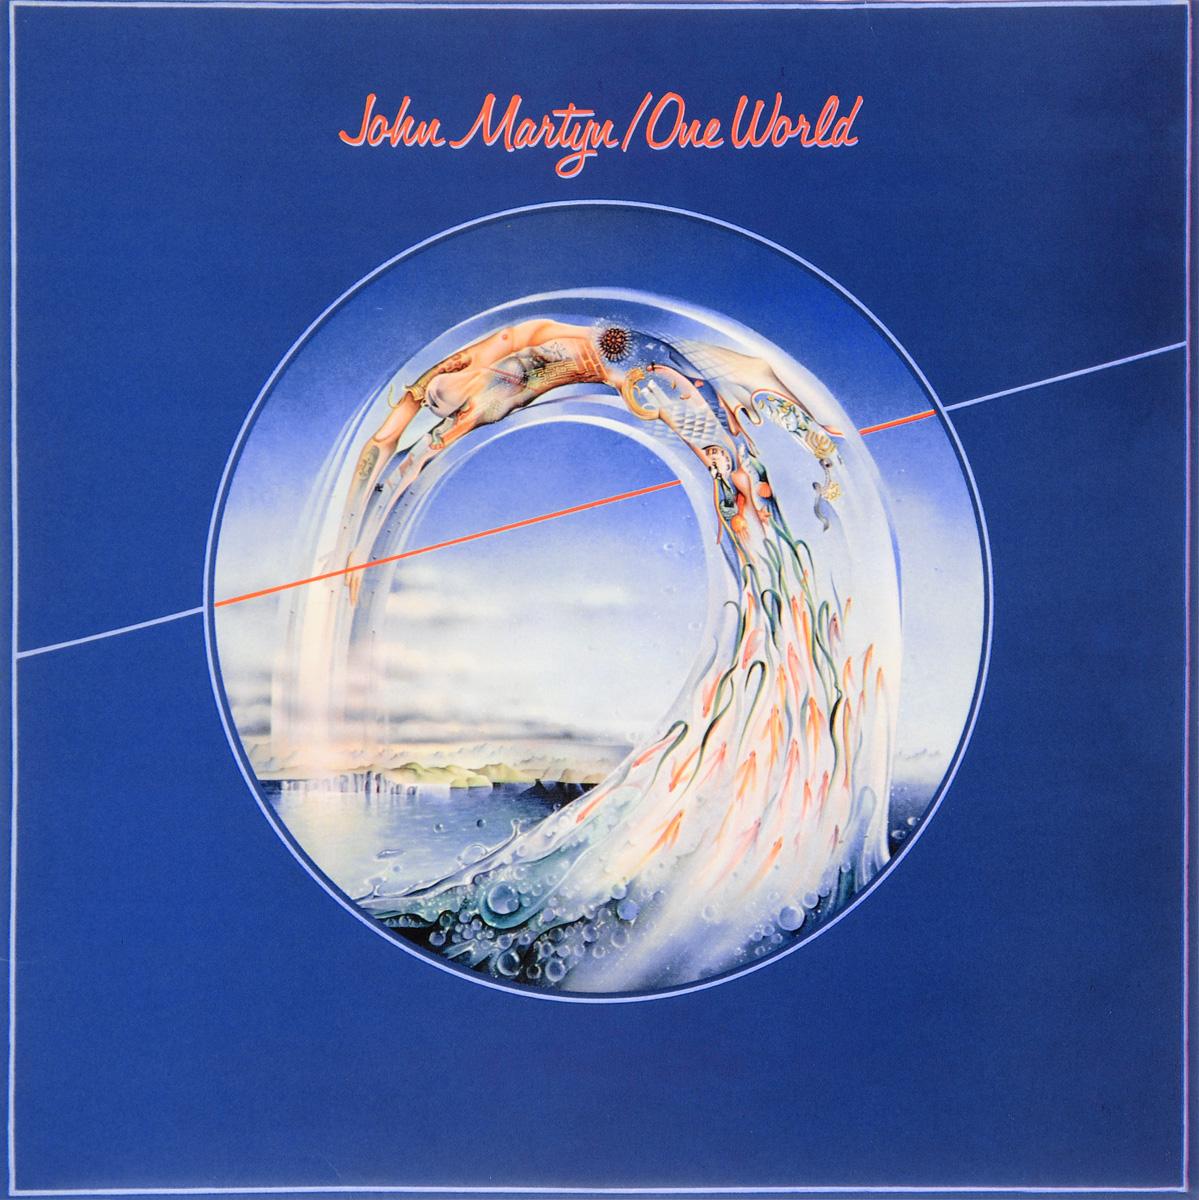 Джон Мартин John Martyn. One World (LP) джон мартин john martyn sapphire 2 lp